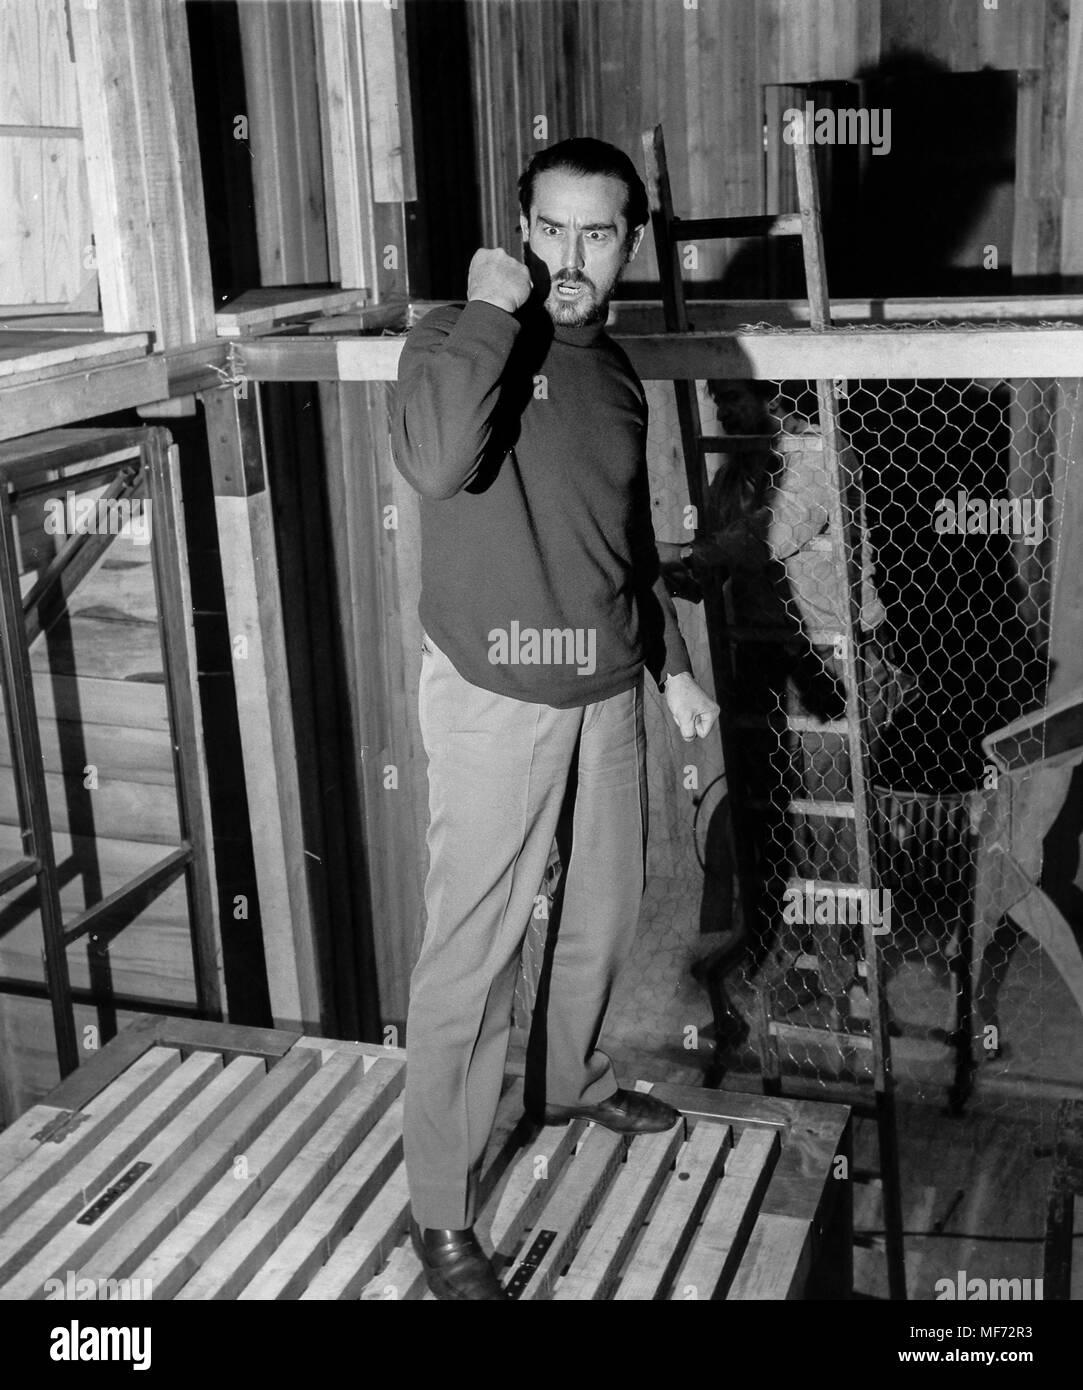 vittorio gassman, 60s - Stock Image